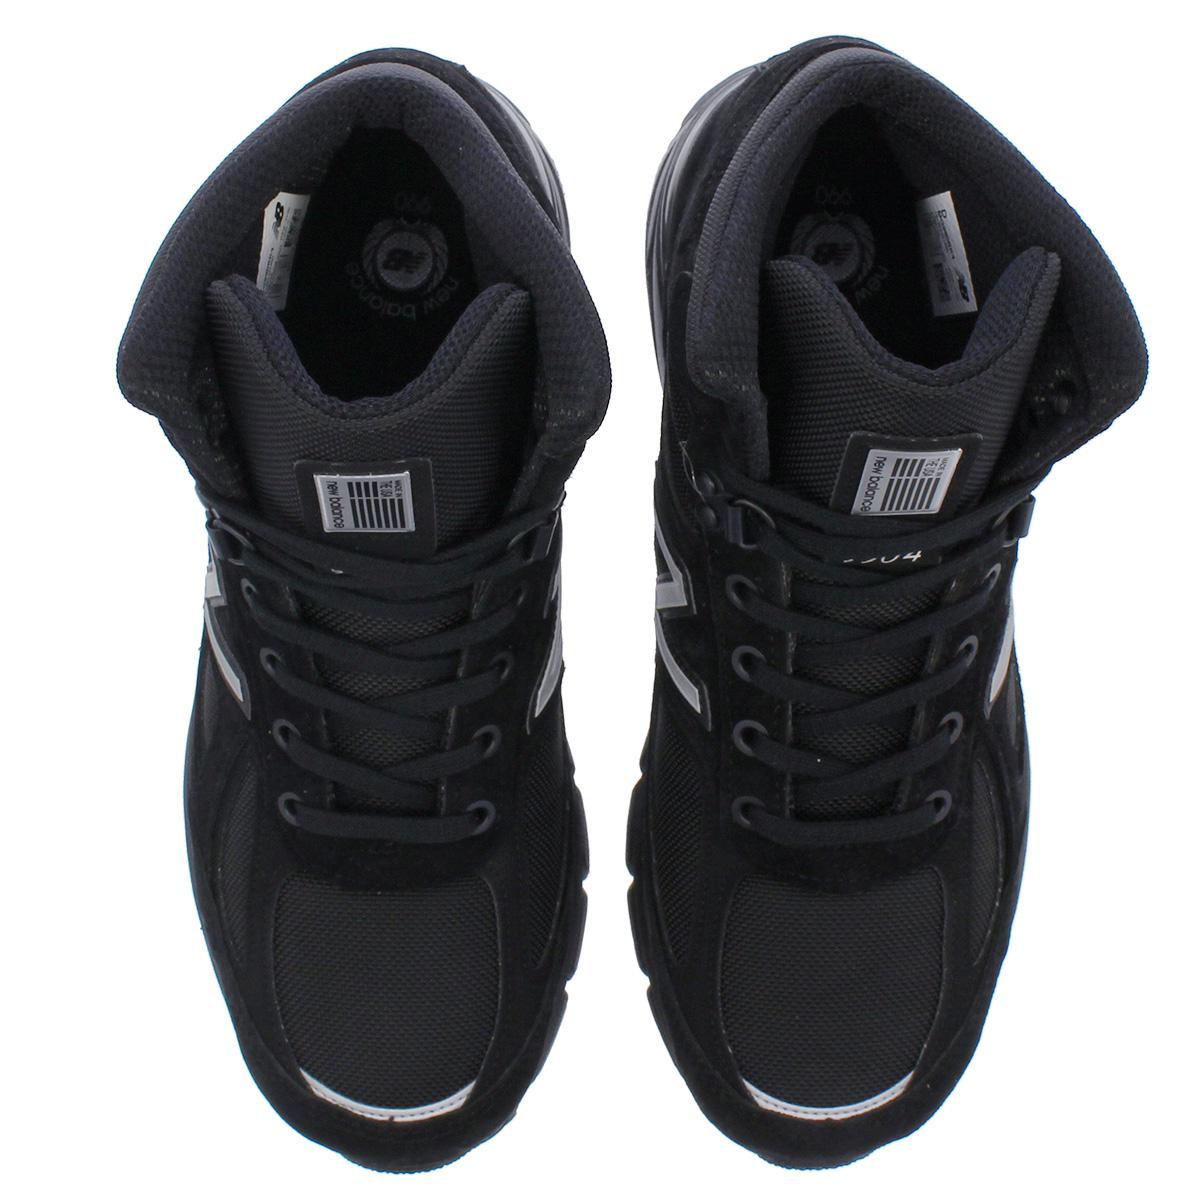 new product 1788a 9774e NEW BALANCE MO990BK4 New Balance MO990 BK4 BLACK